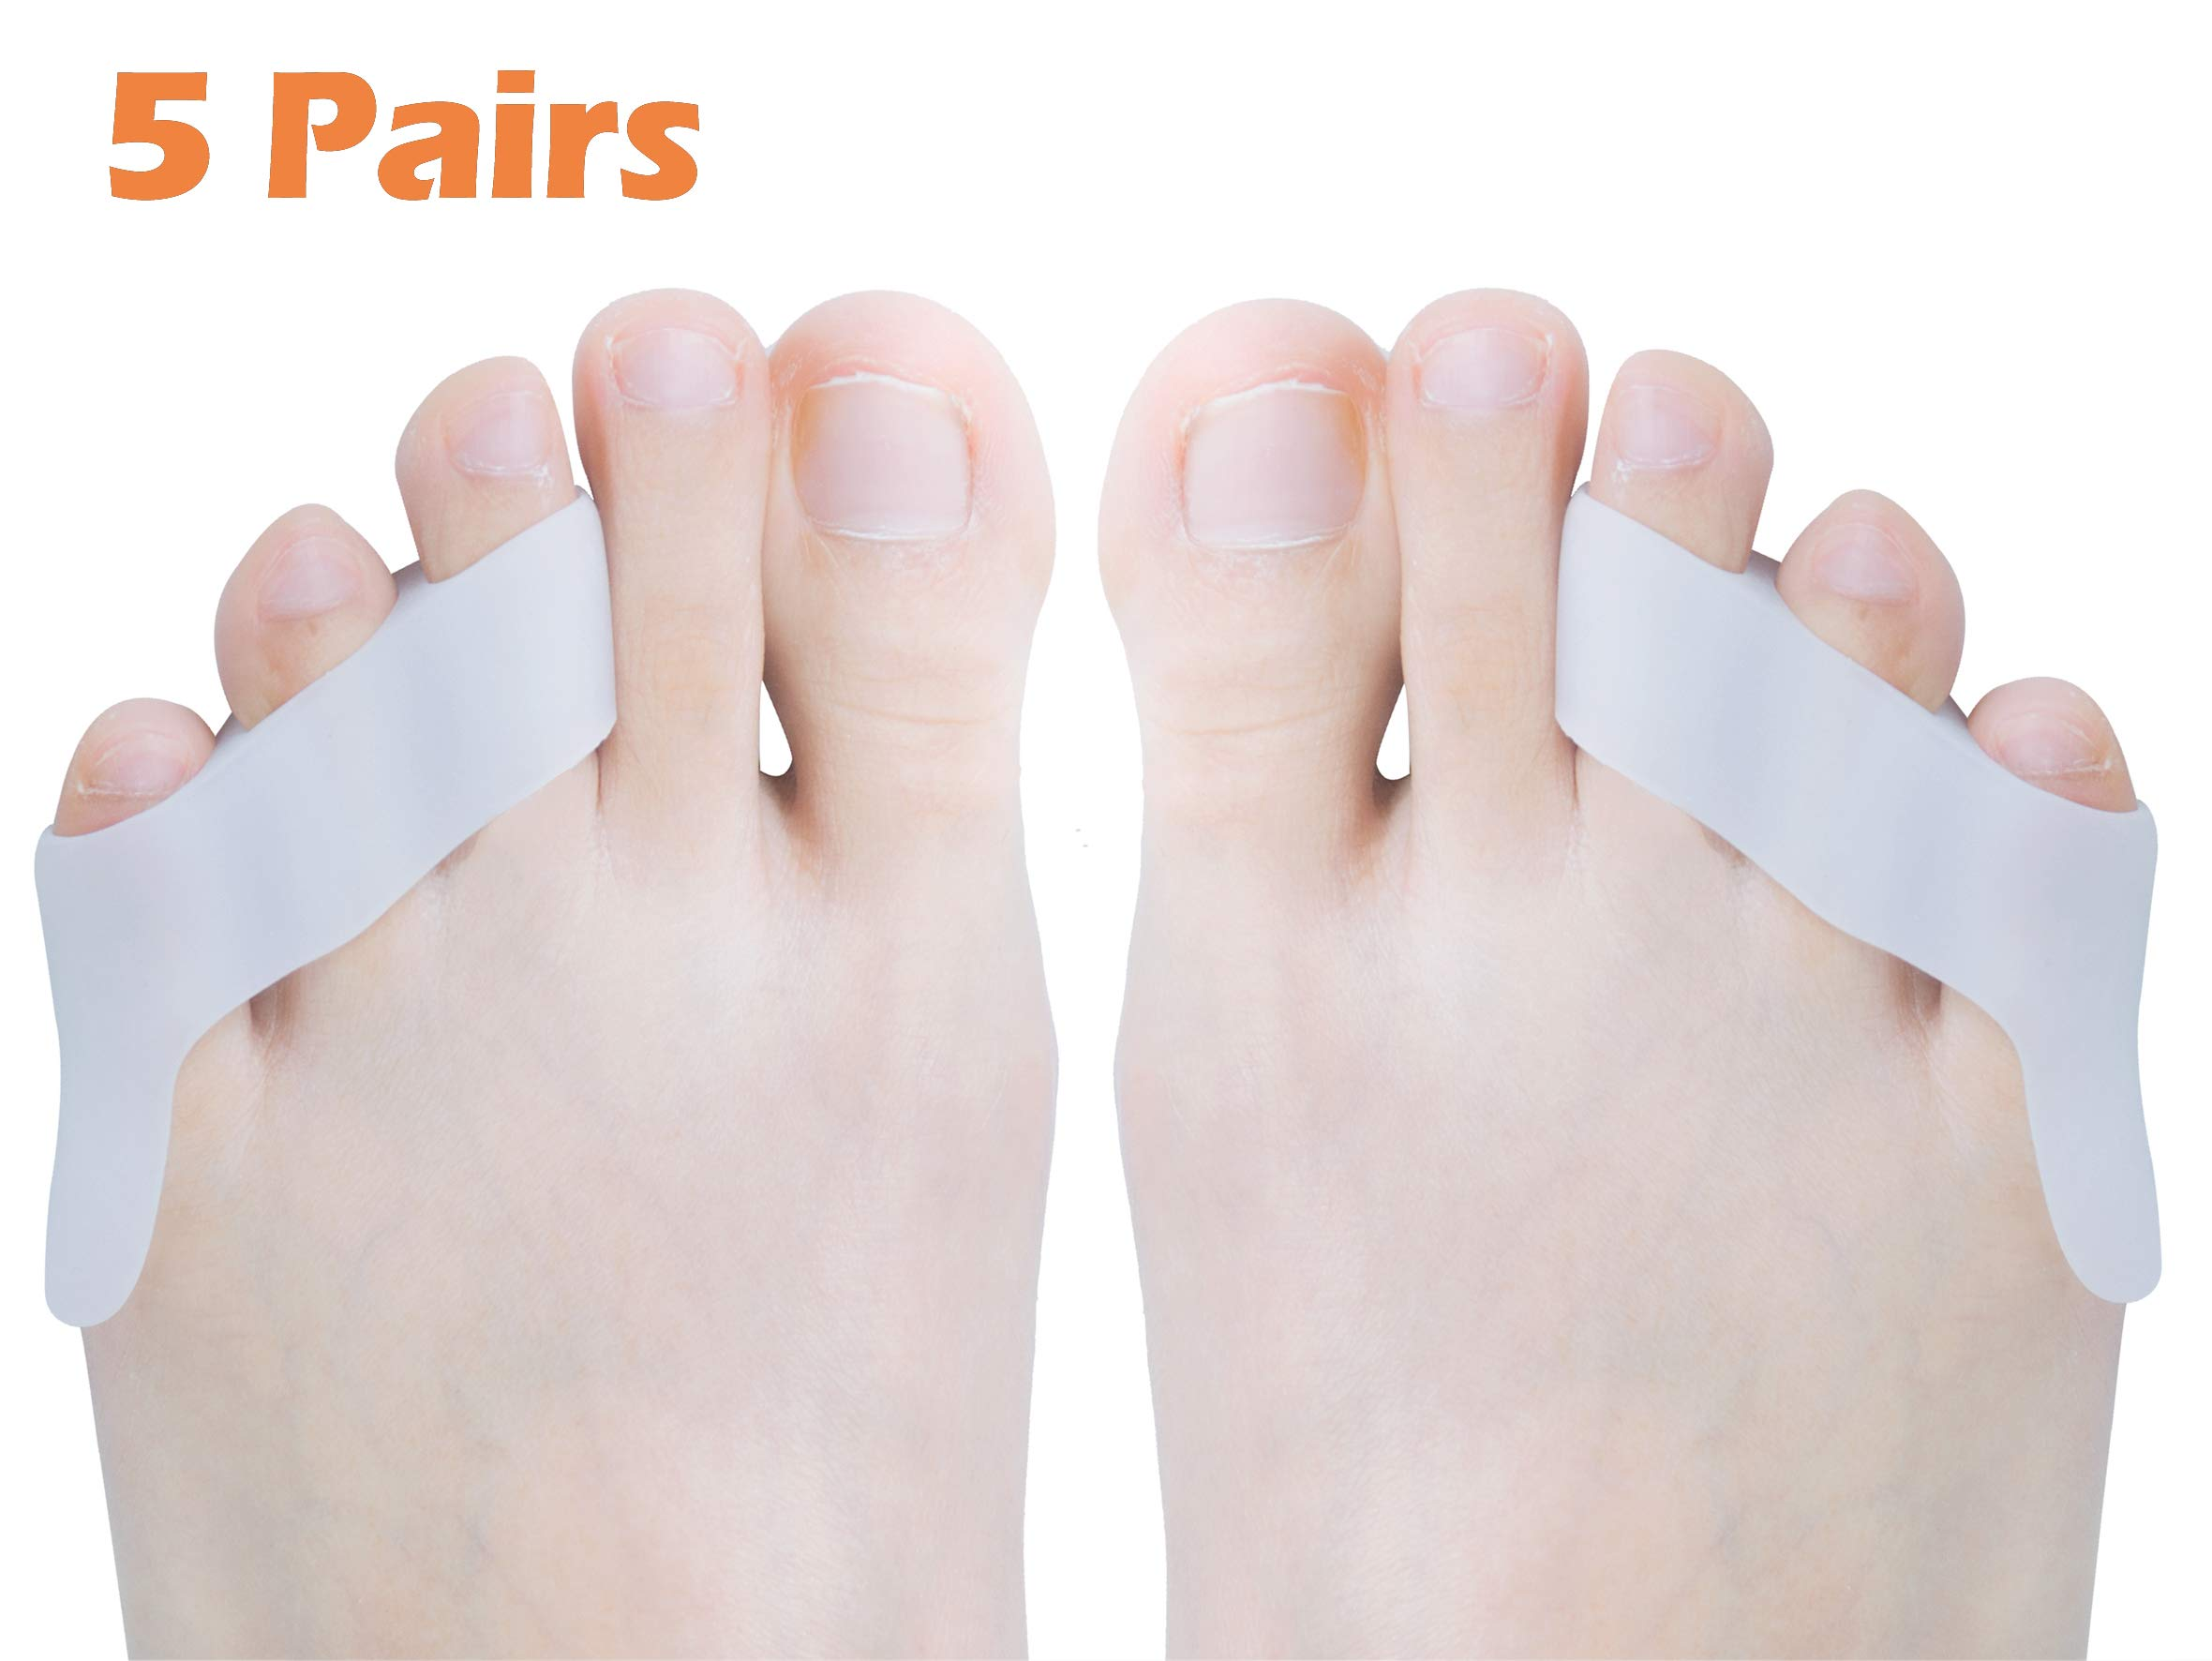 Povihome Pinky Toe Separator & Straightener, Triple Gel Toe Separators for Overlapping Toe, Pinky Hammer Toes - 5 Pairs